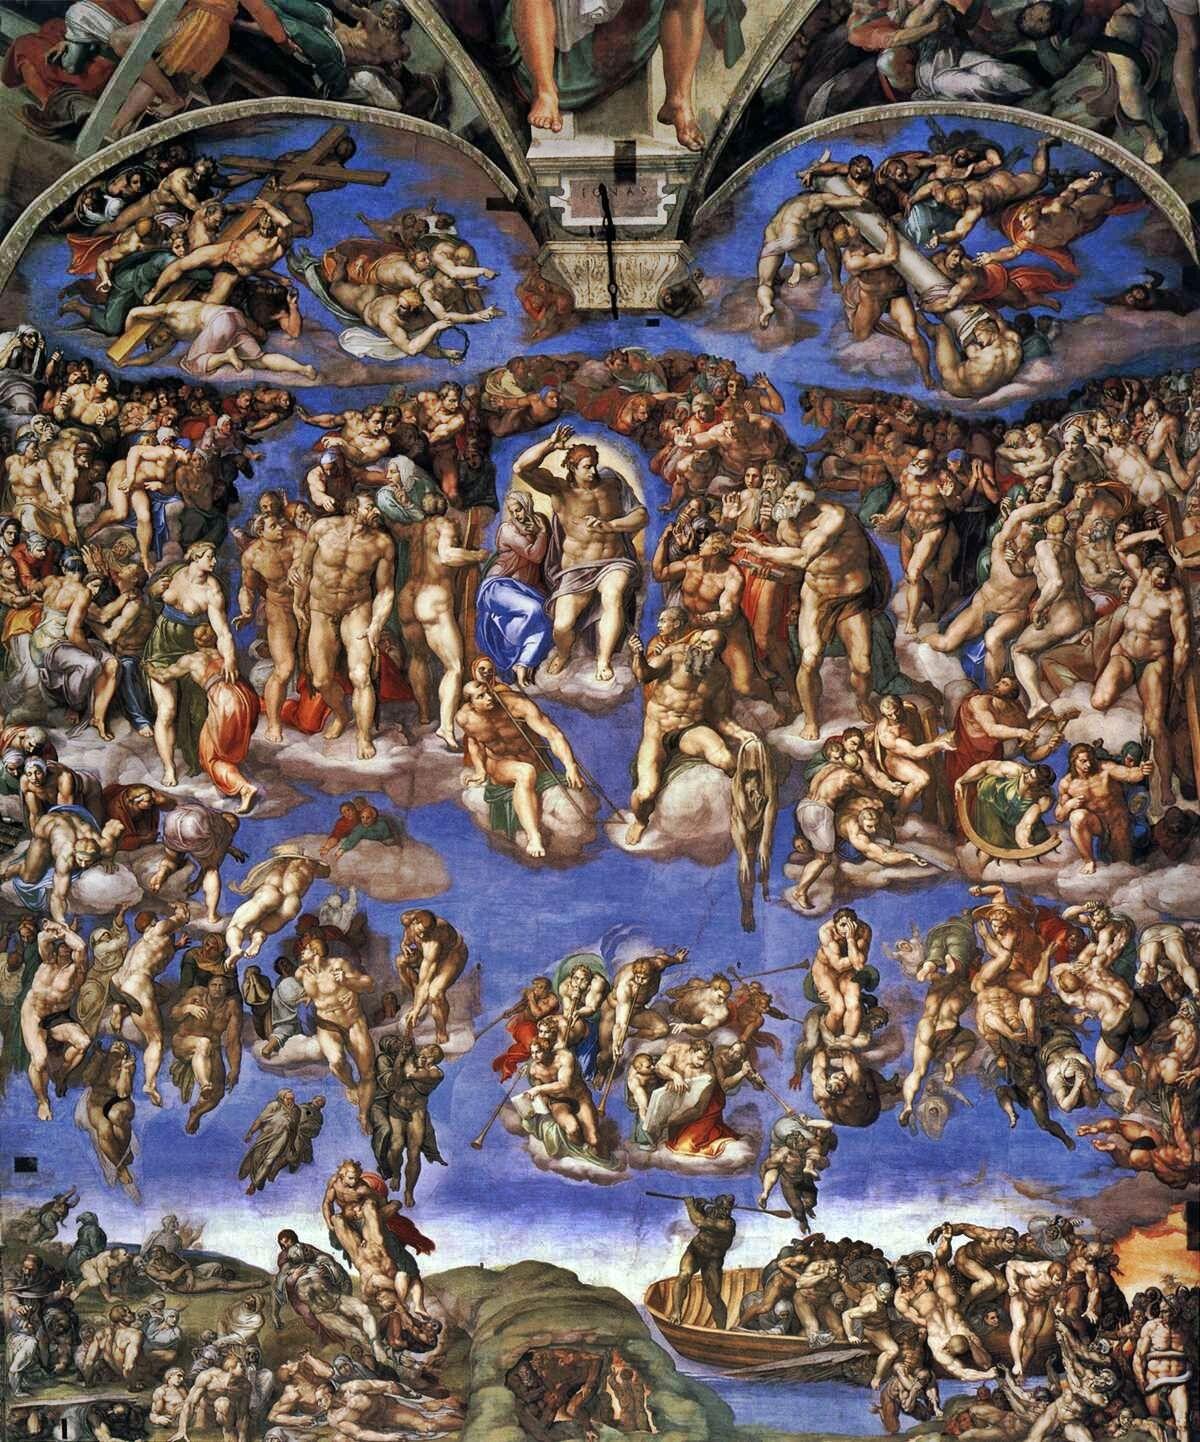 Michaelangelo, Last Judgment, 1536-41. Photo via Wikimedia Commons.